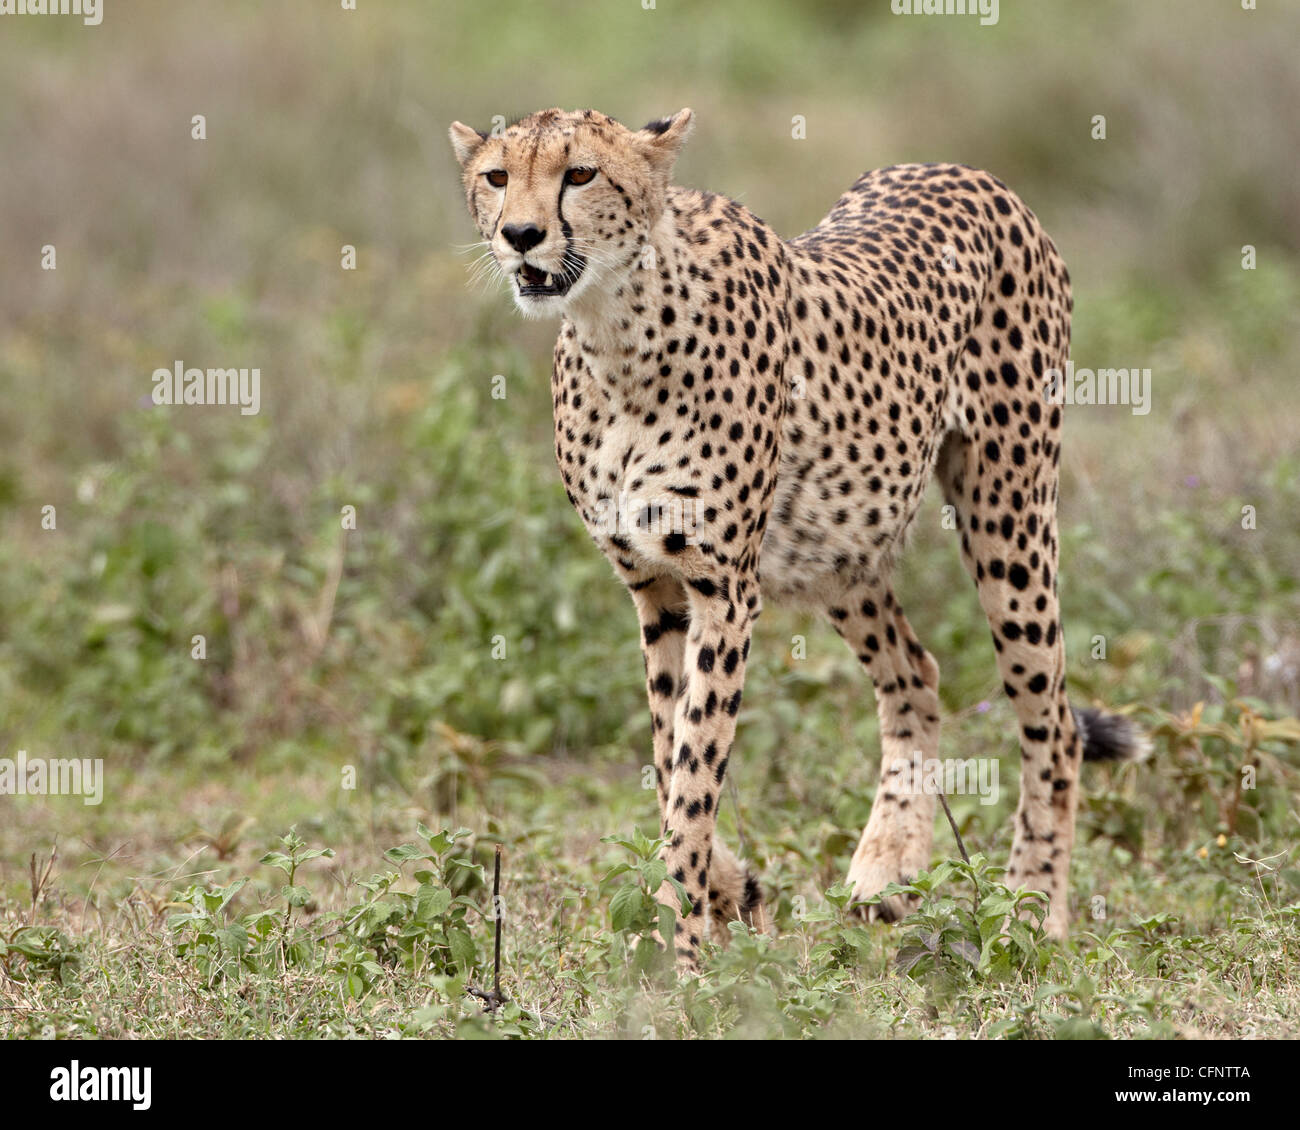 Cheetah (Acinonyx jubatus), Serengeti National Park, Tanzania, East Africa, Africa - Stock Image